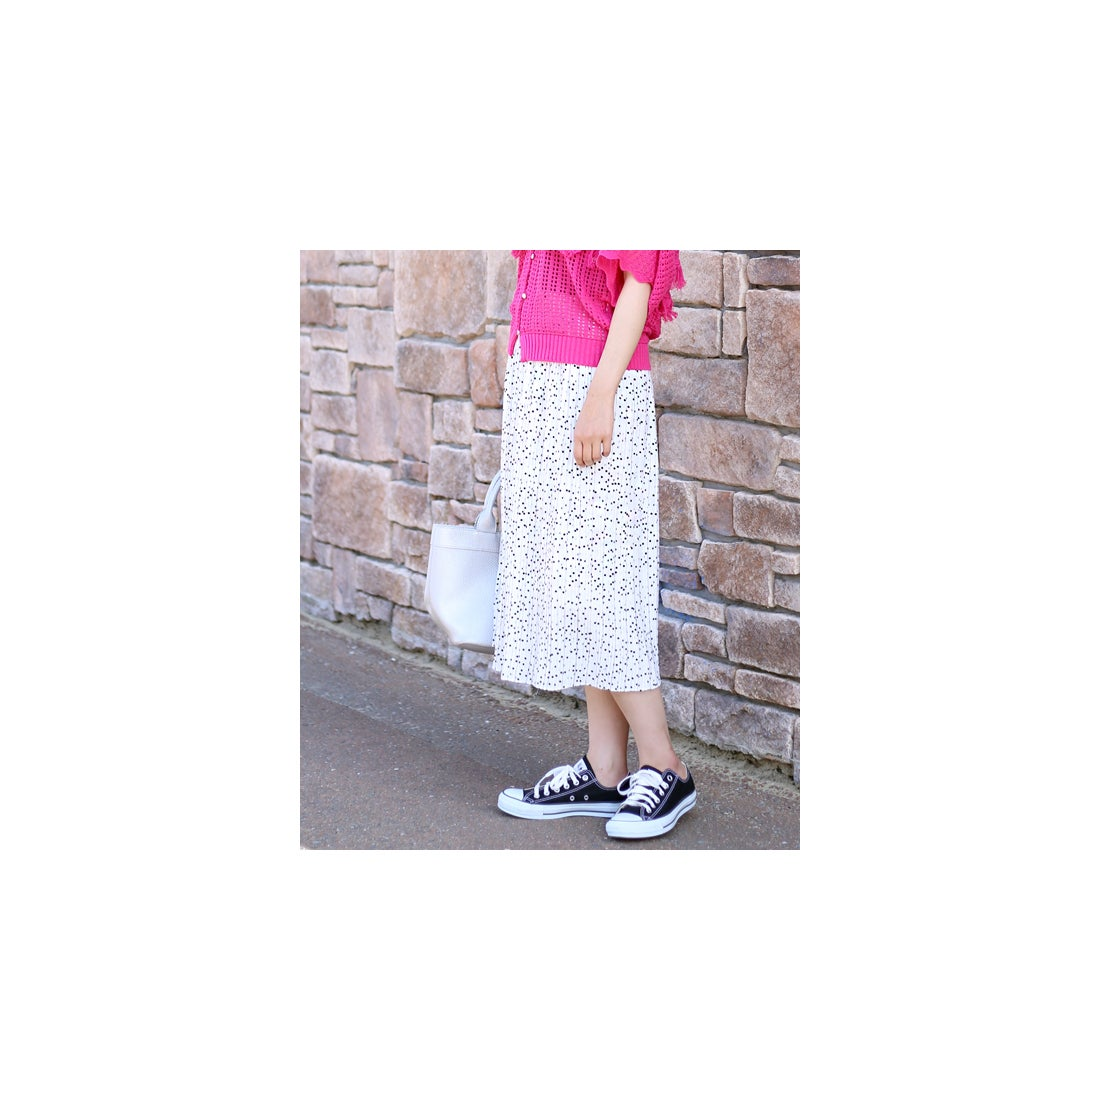 c5b35d8212943 Bou Jeloud  WEB限定 ドットプリーツミディスカート(オフホワイト) 返品不可商品  -靴&ファッション通販 ロコンド〜自宅で試着、気軽に 返品